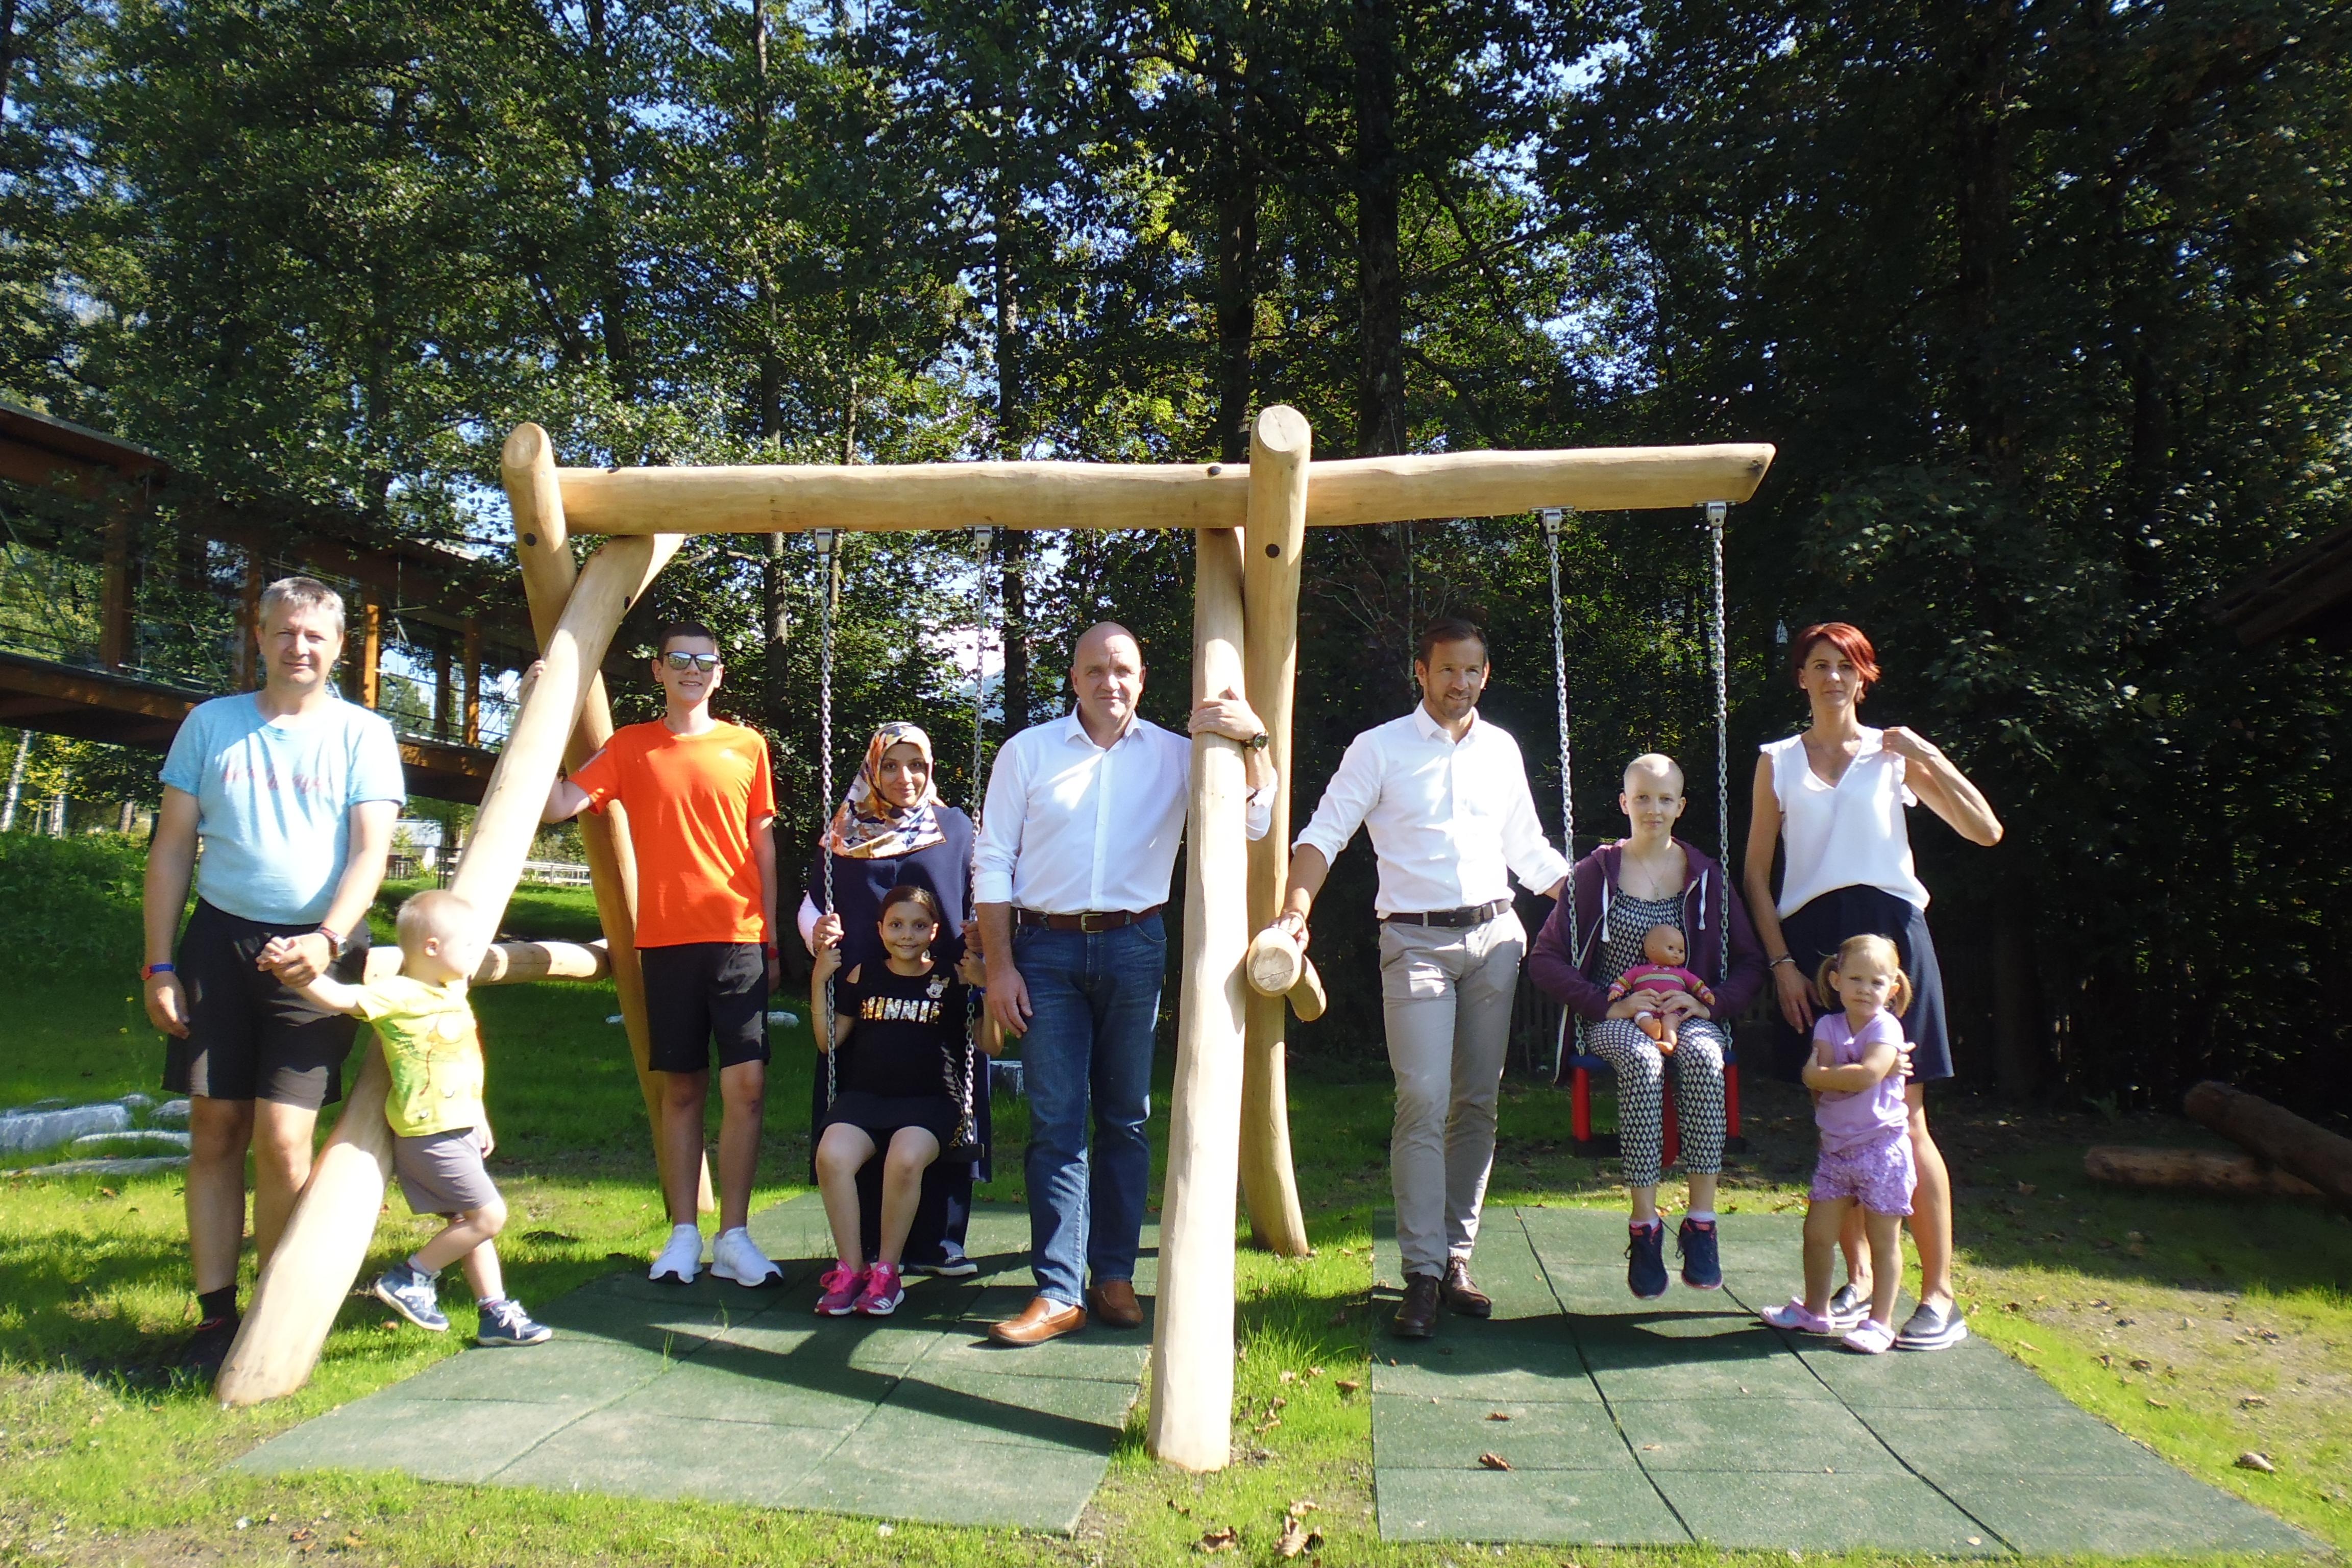 Eröffnung Outdoor-Kinderspielplatz in St. Veit/Pongau